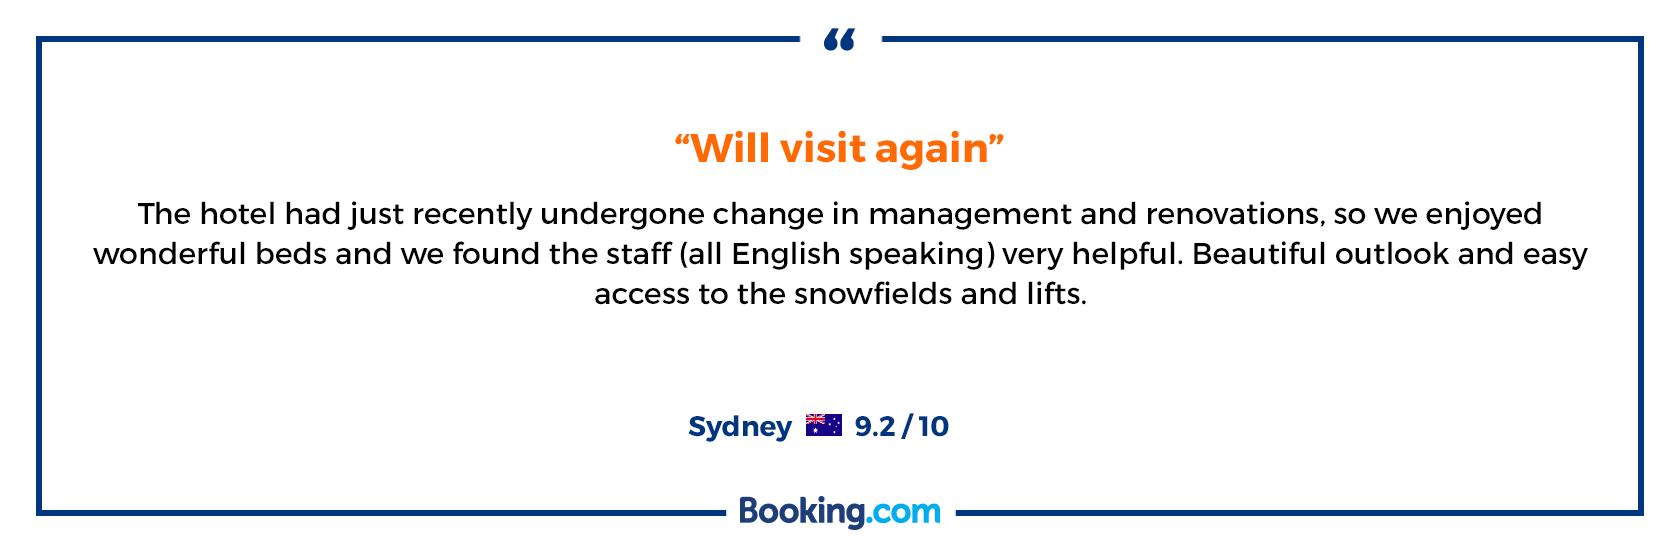 Booking.com_Sydney